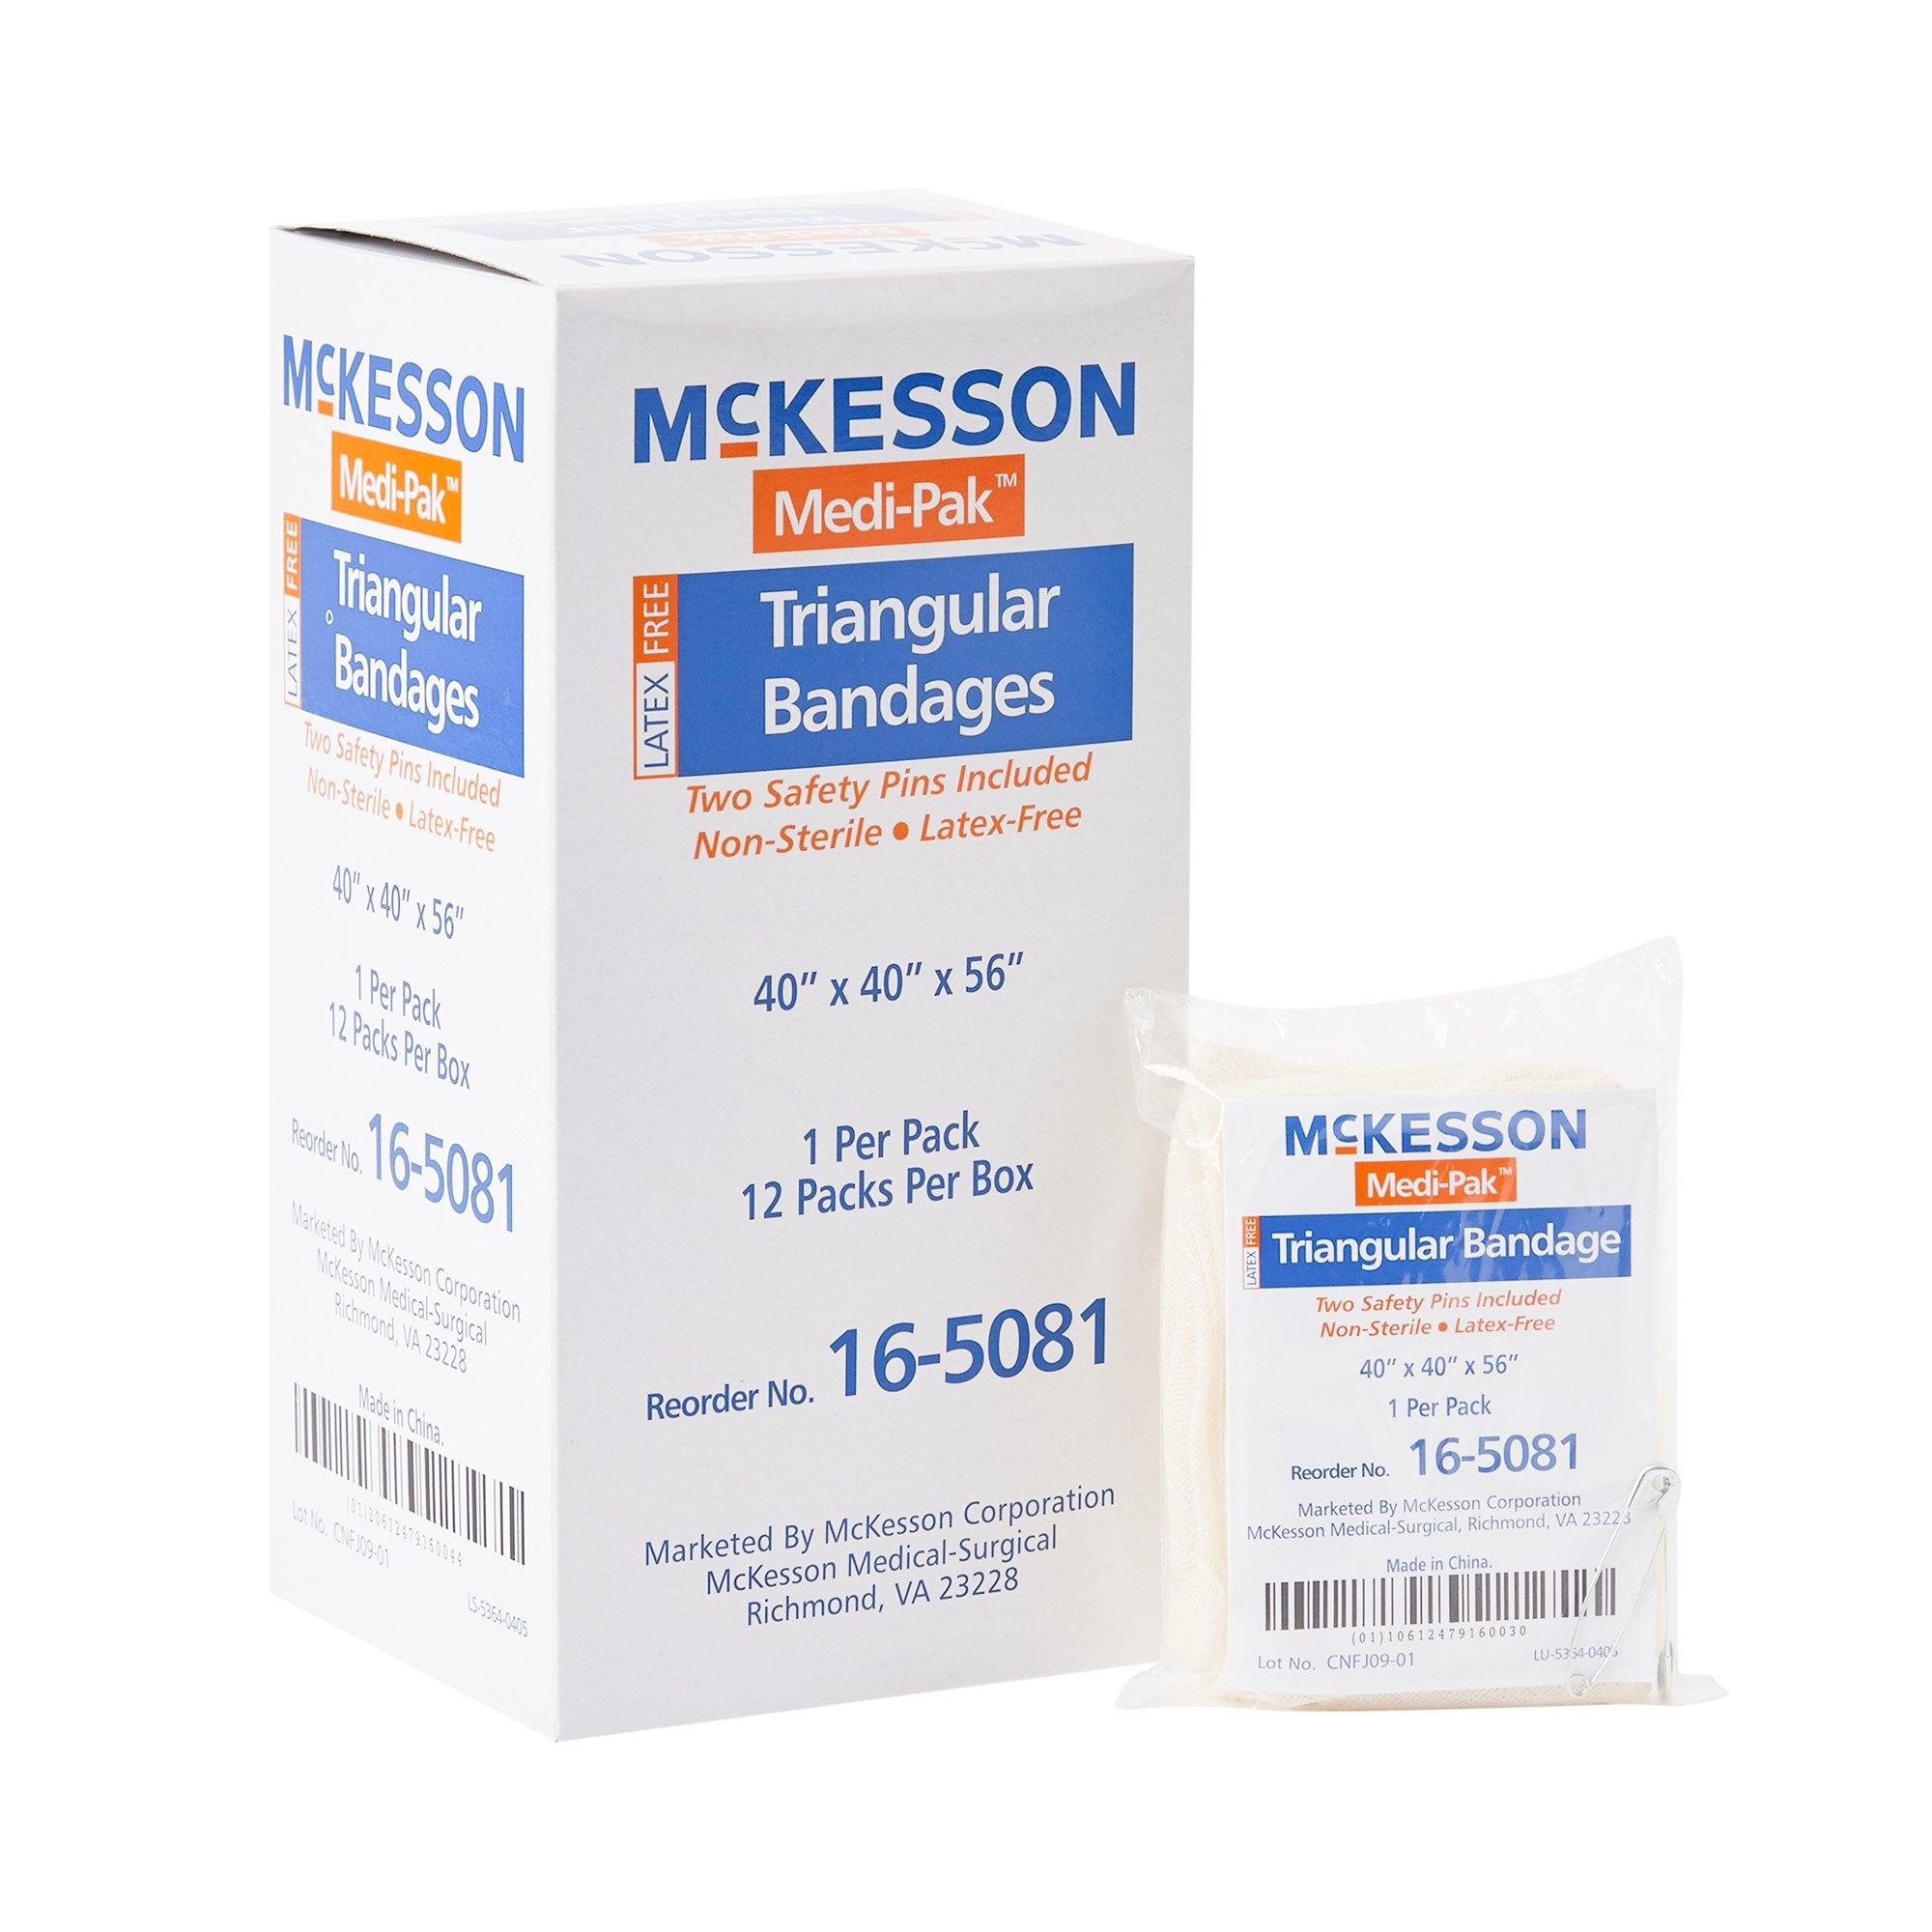 McKesson Medi-Pak Triangular Bandages/Sling, 16-5081, Case of 72 (6 Boxes)